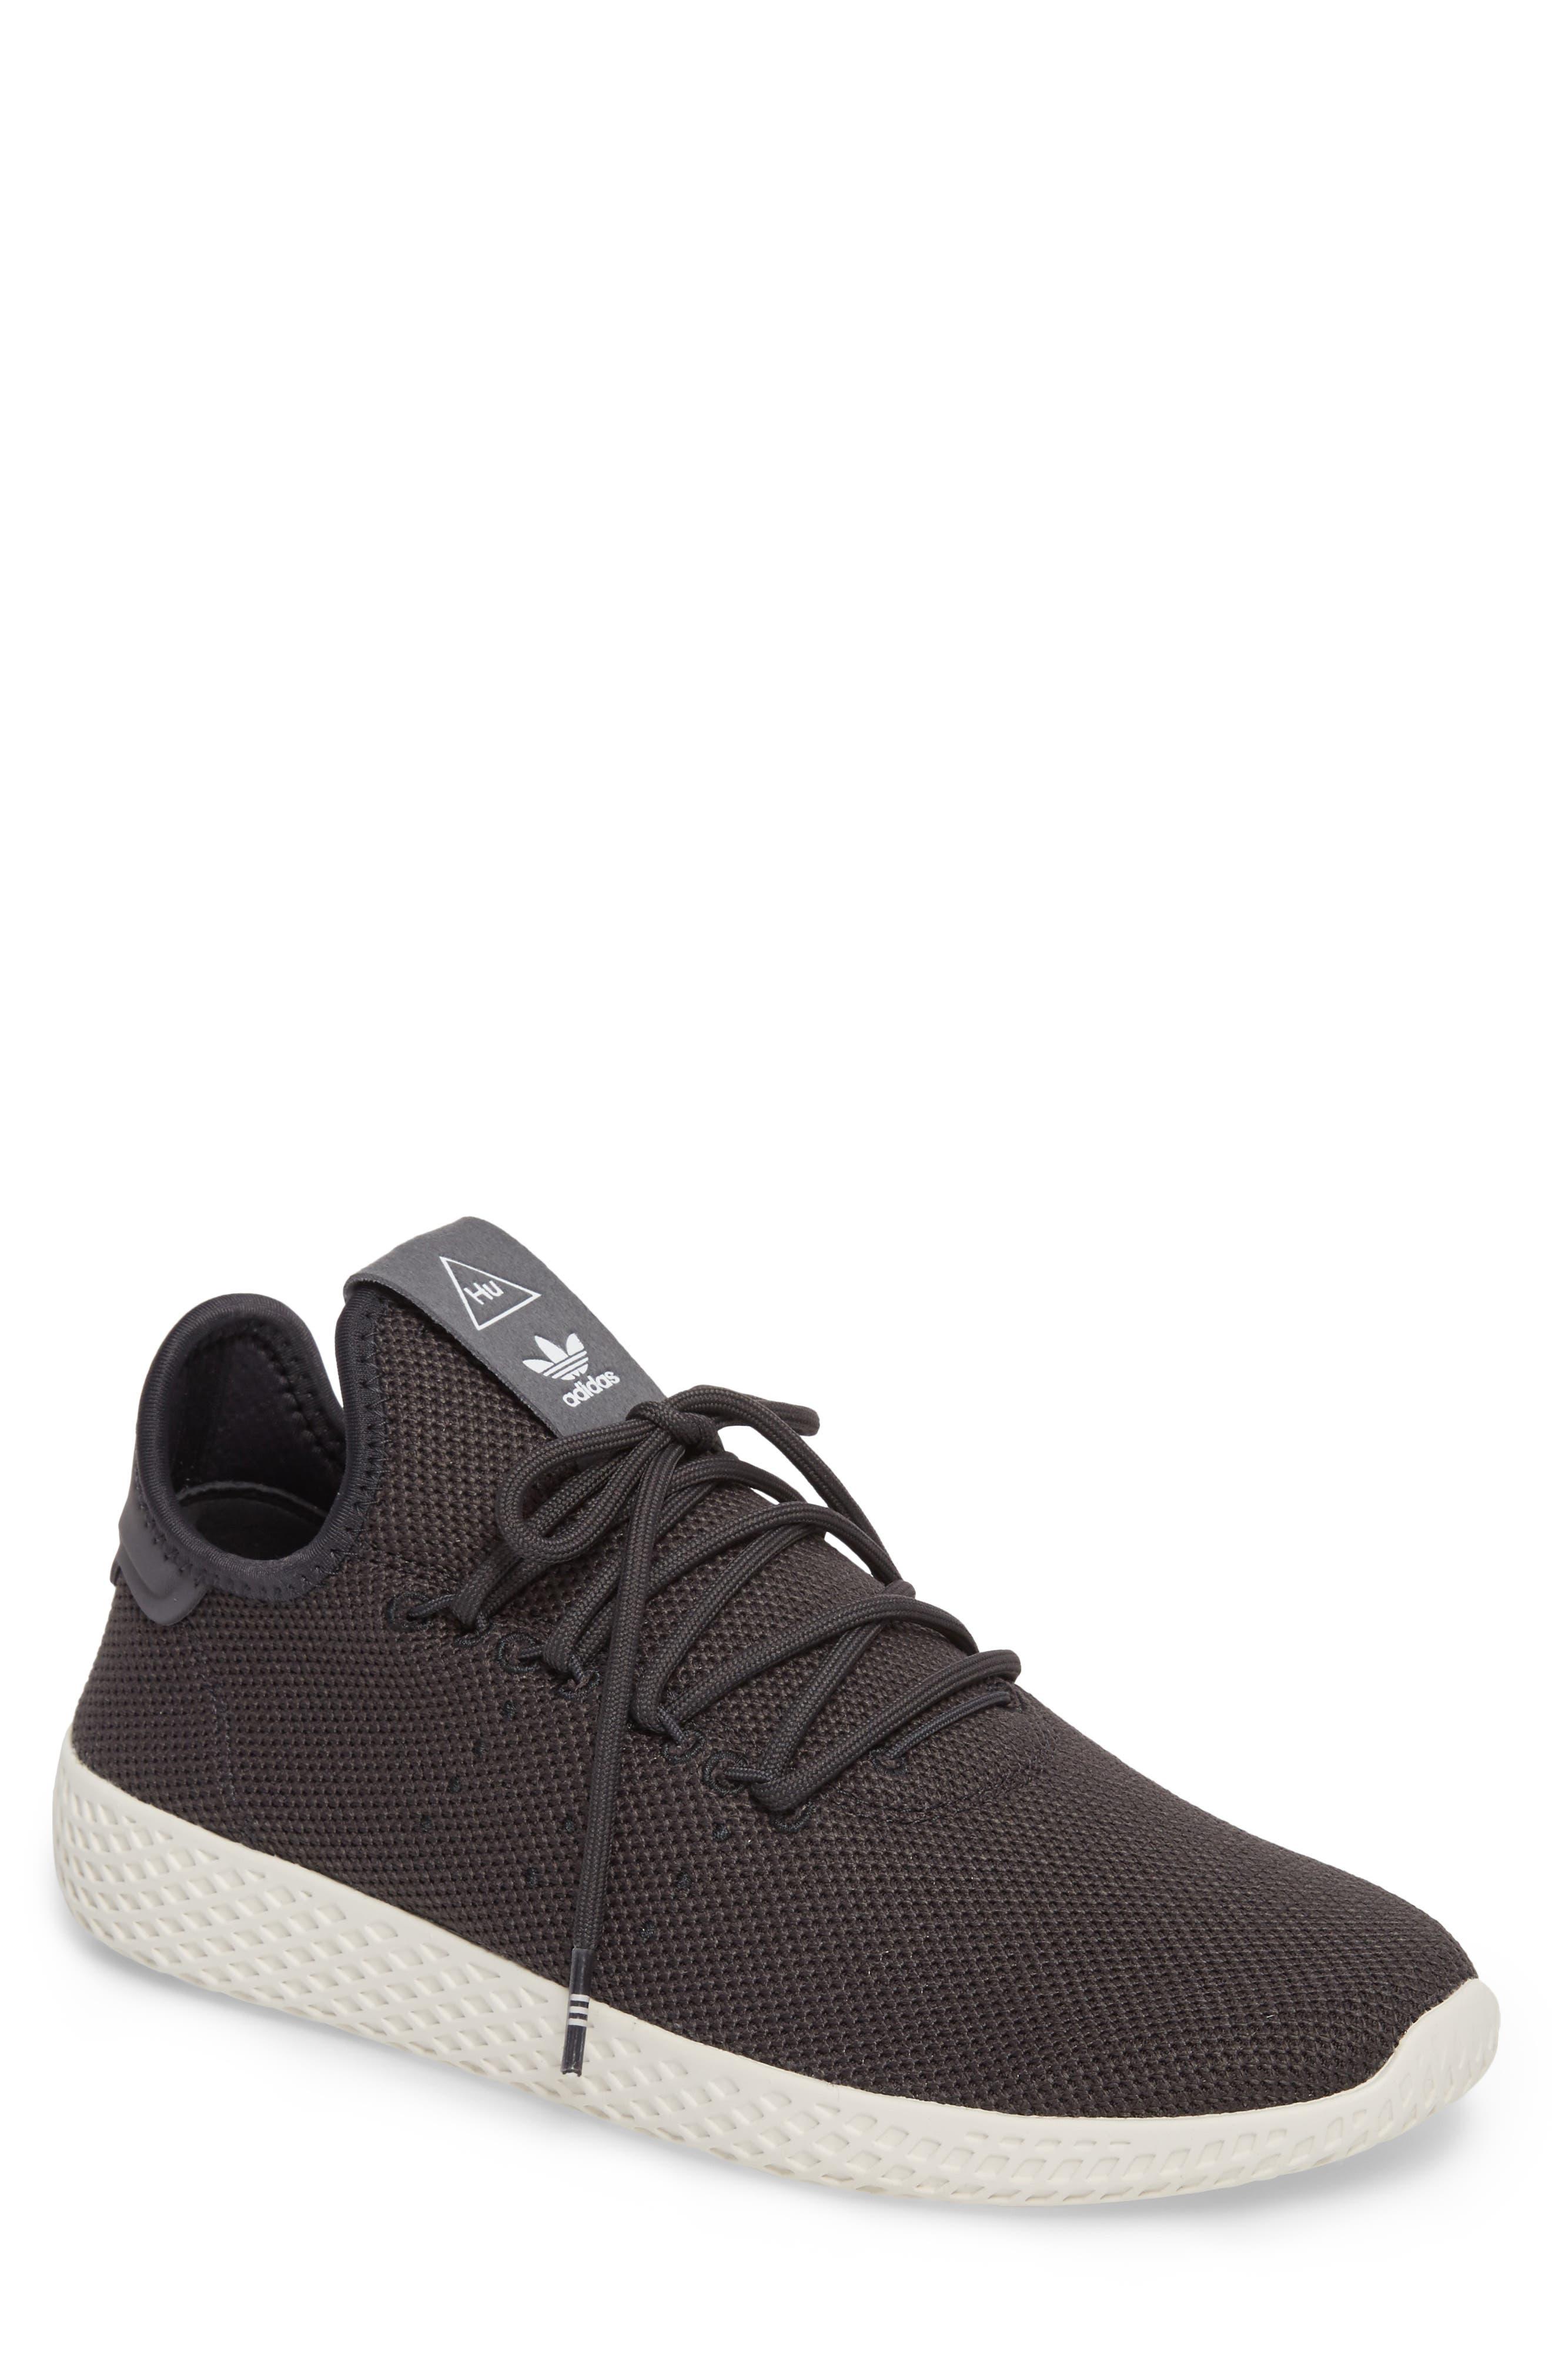 Pharrell Williams Tennis Hu Sneaker,                         Main,                         color, Carbon / Carbon / Chalk White